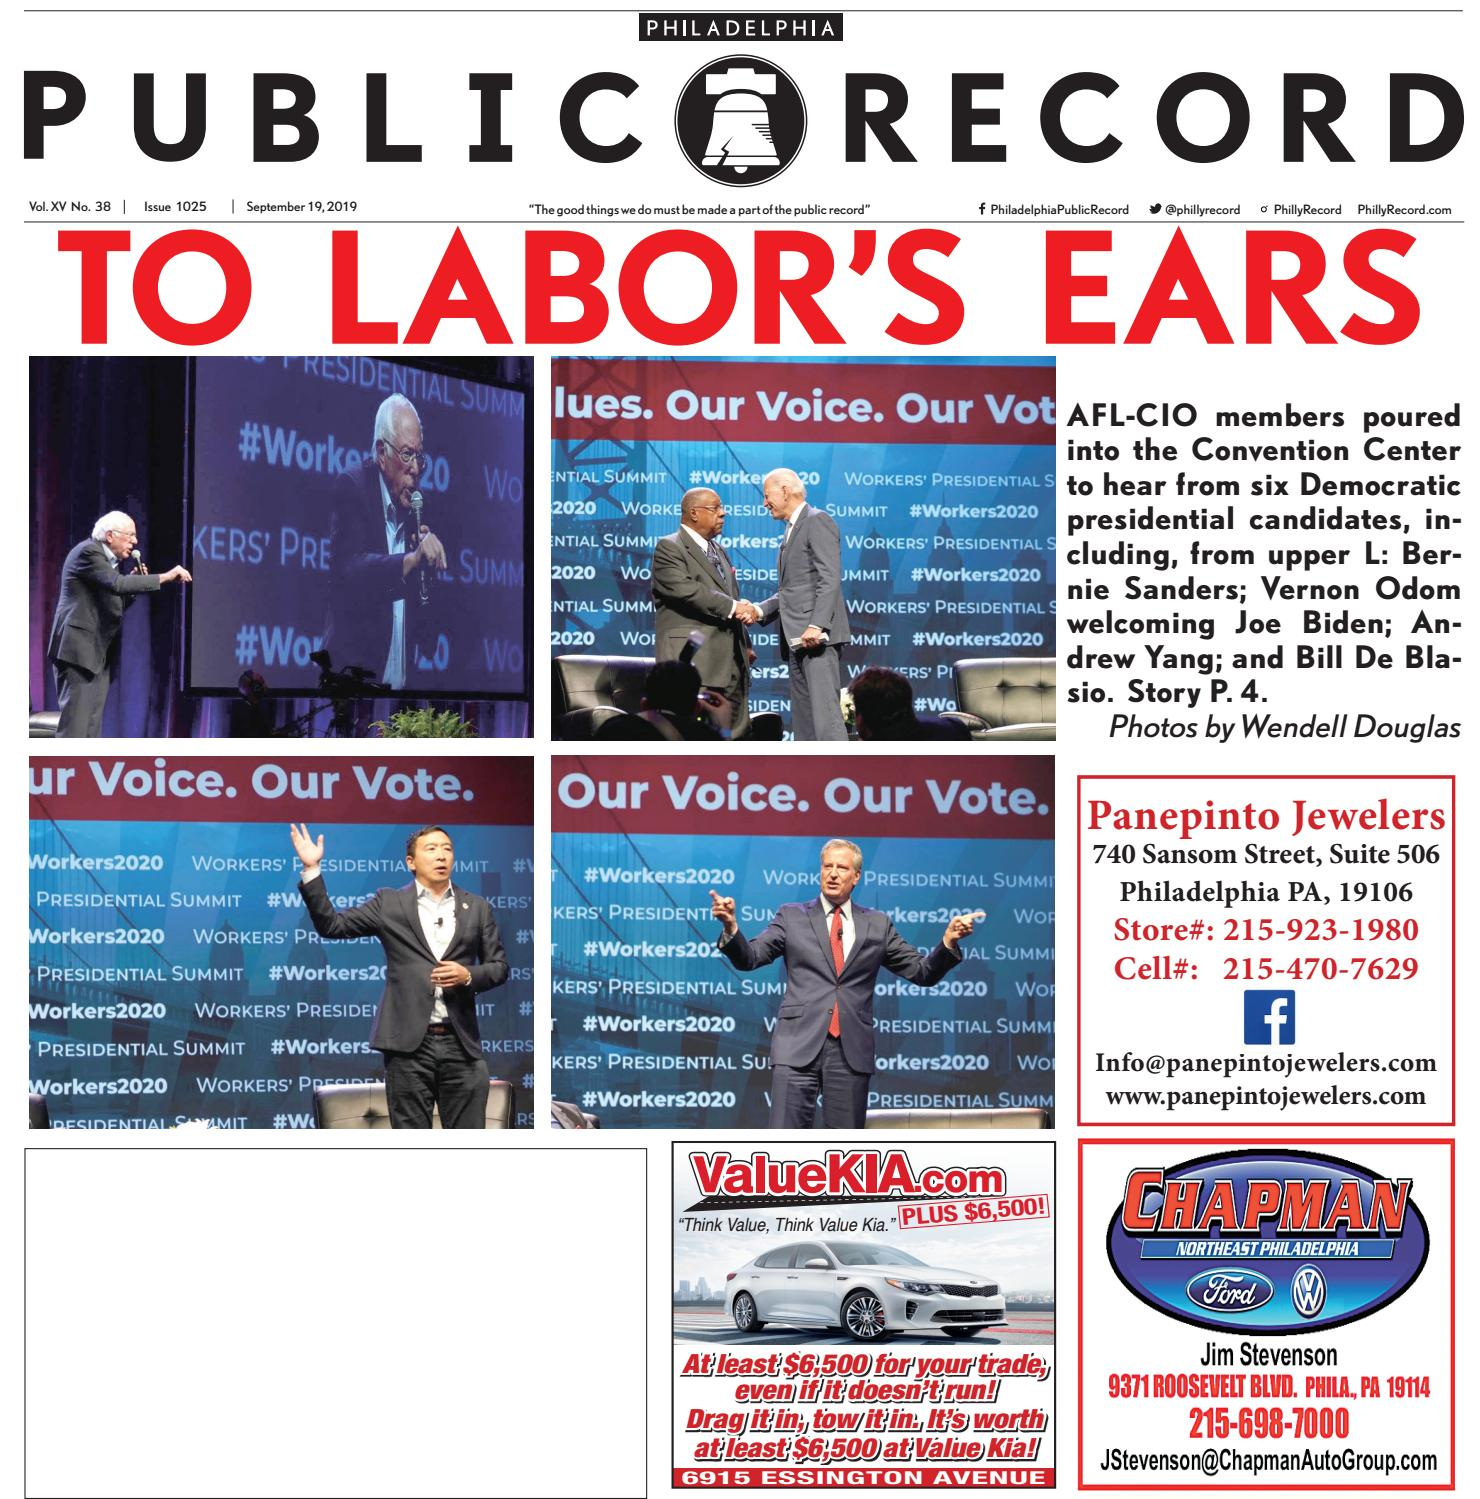 Value Kia Philadelphia >> Philadelphia Public Record by The Public Record - Issuu